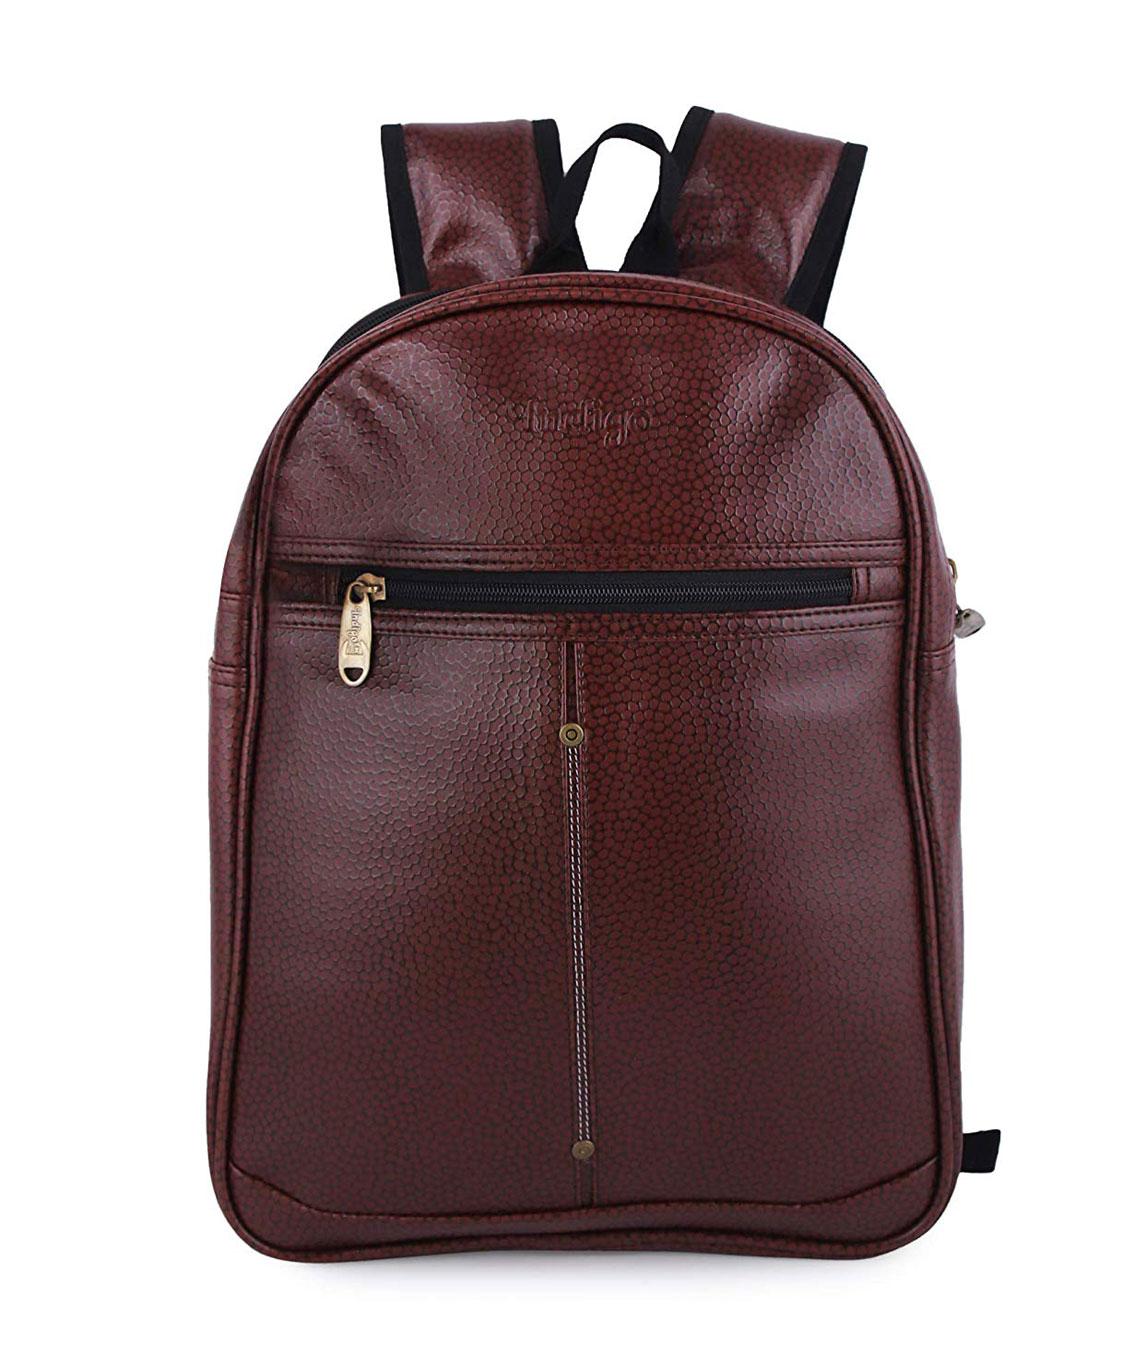 Safar 30 Liters Casual Bagpack/School Bag/Laptop Backpack(Choclate Brown)